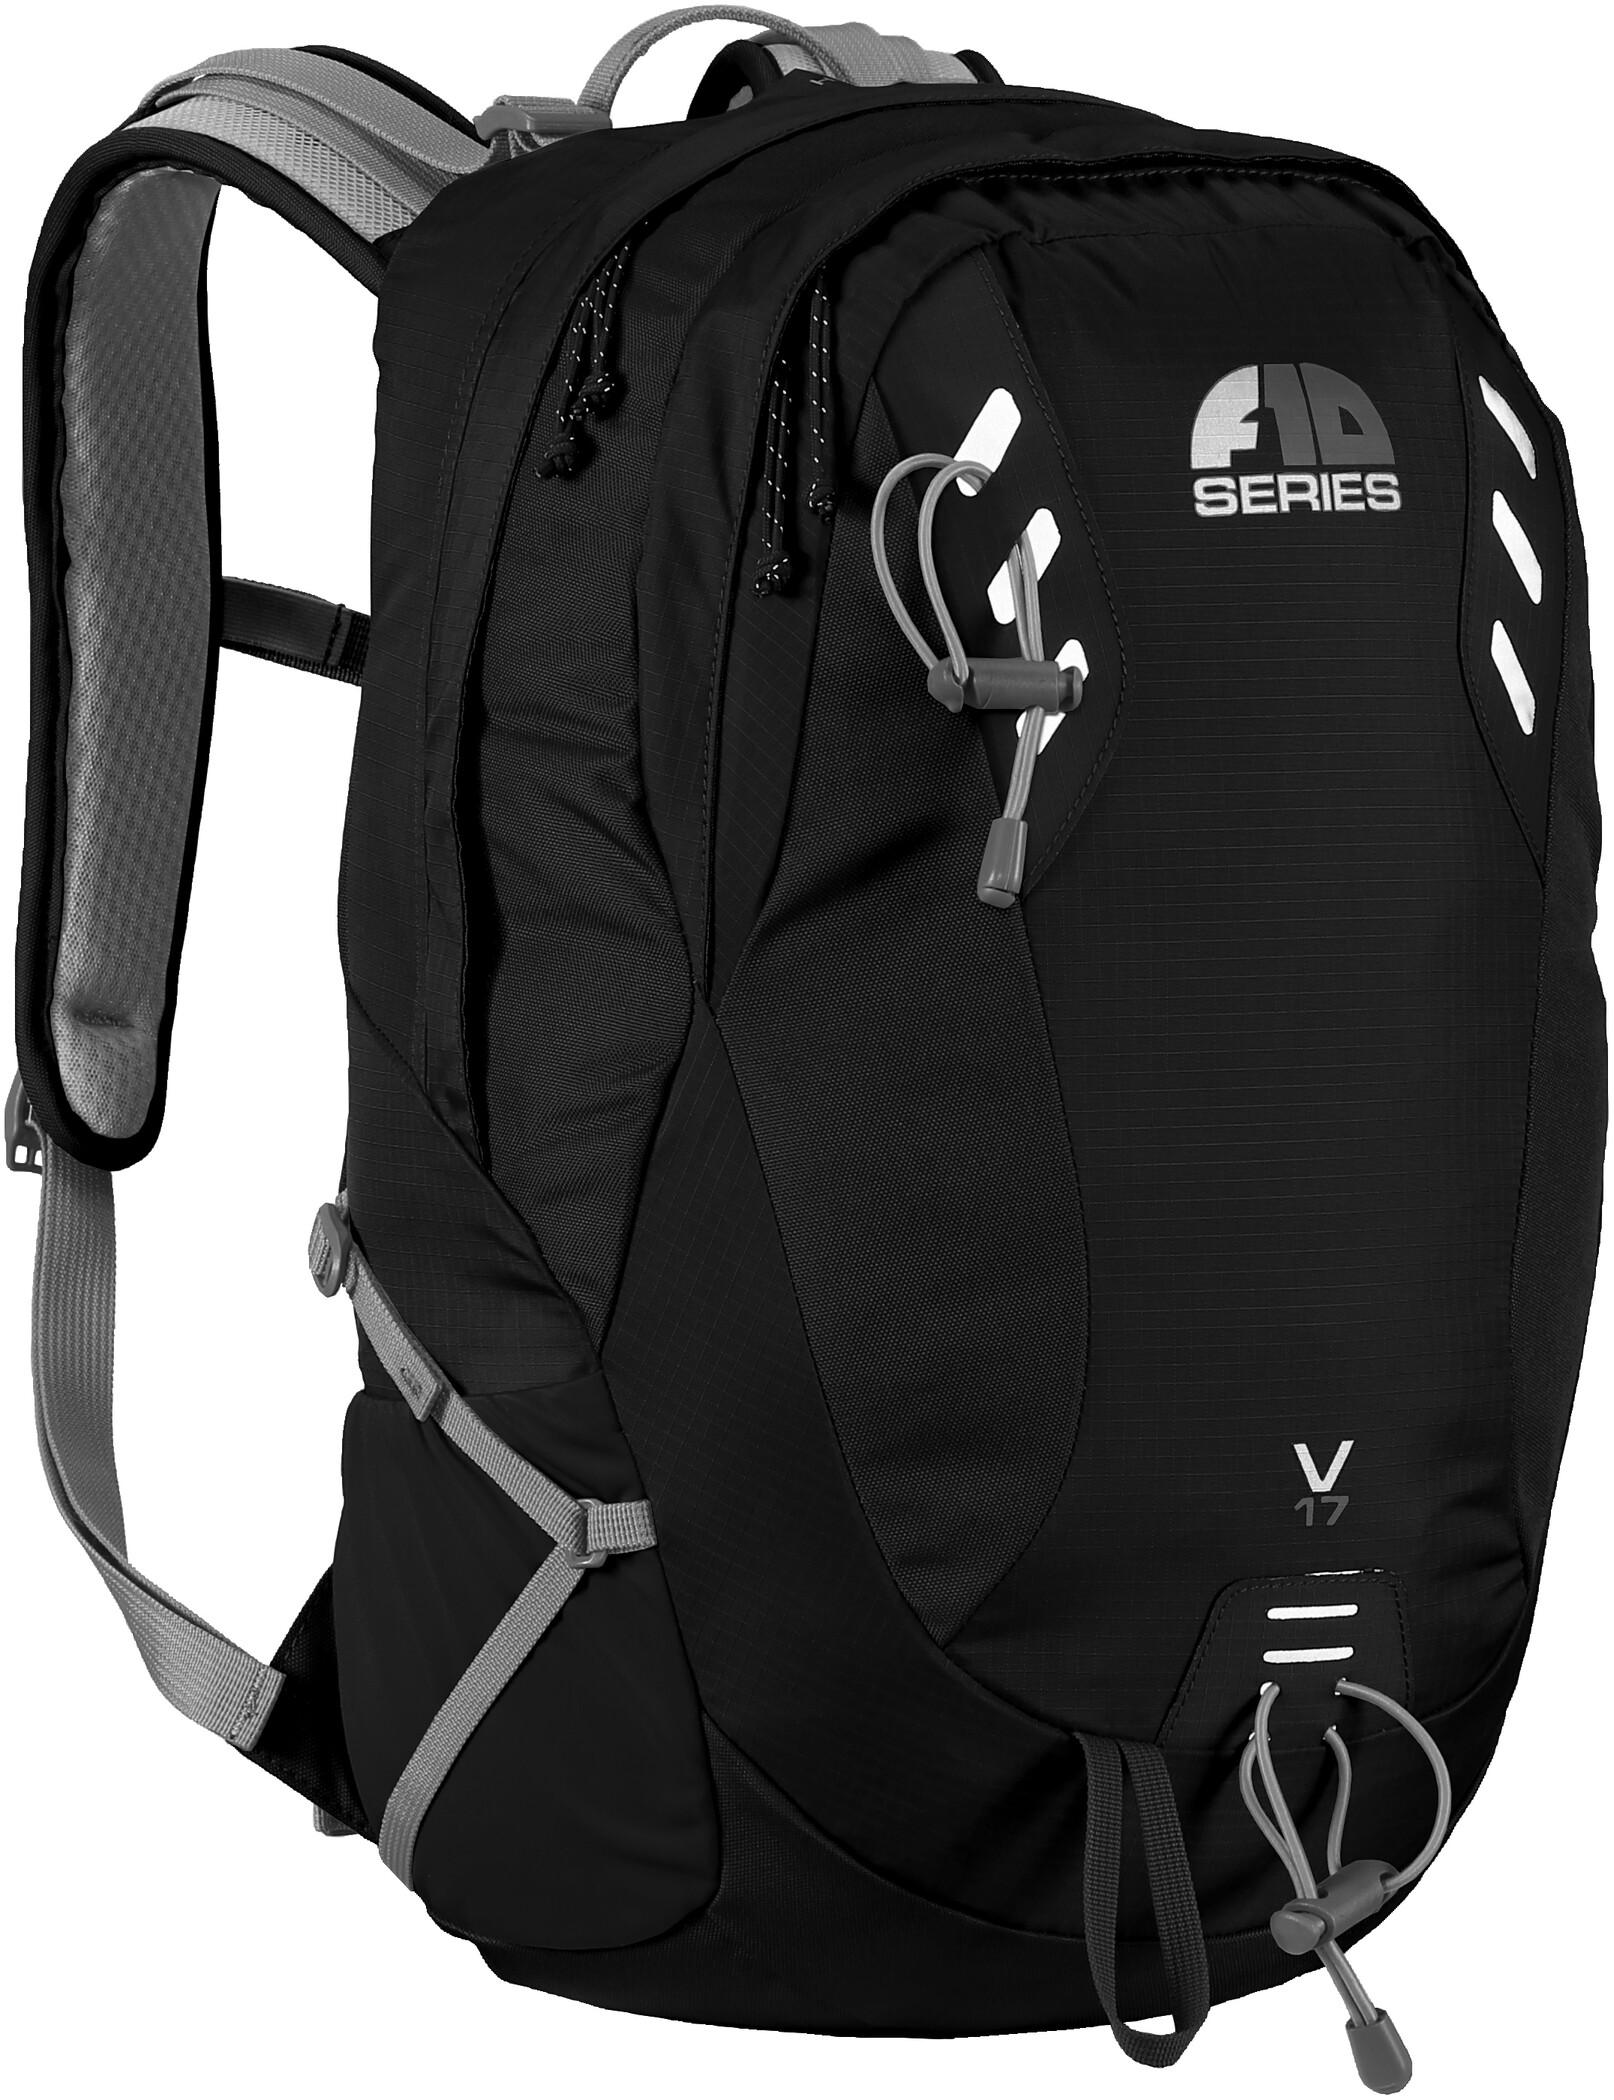 Vango F10 V 17 Rygsæk, black (2019) | Travel bags